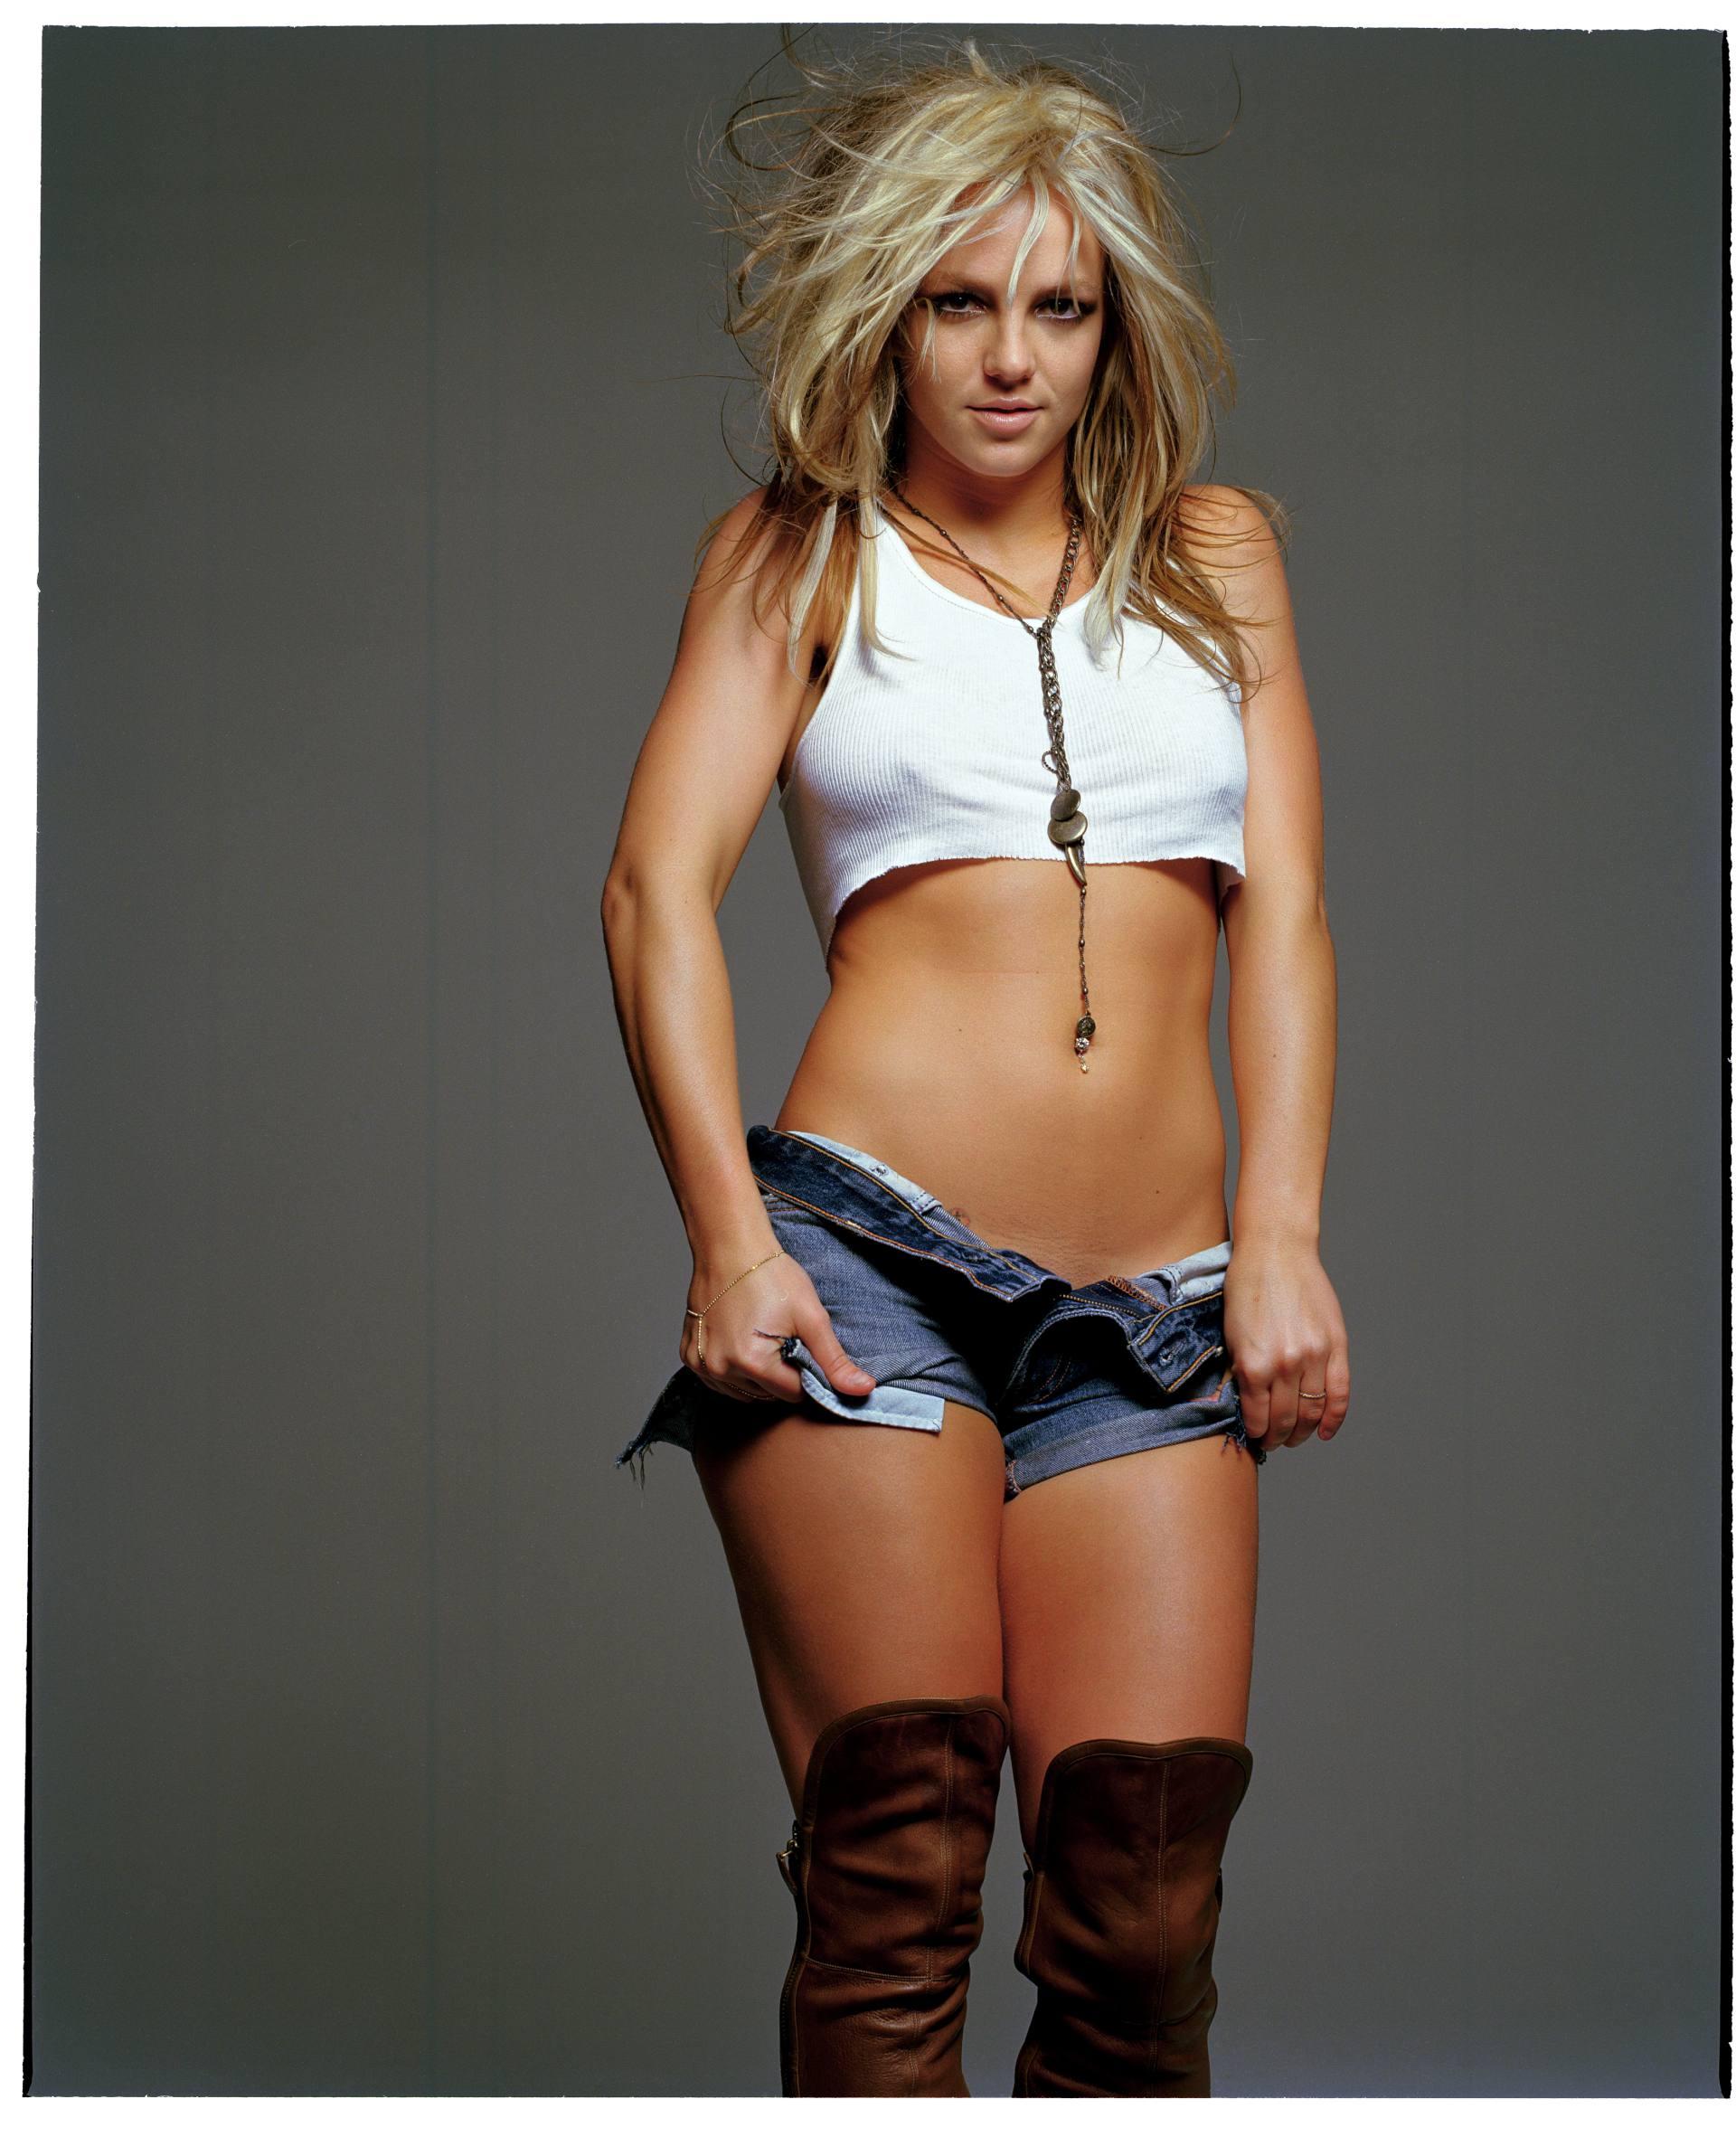 Britney Spears Sexy Photoshoot